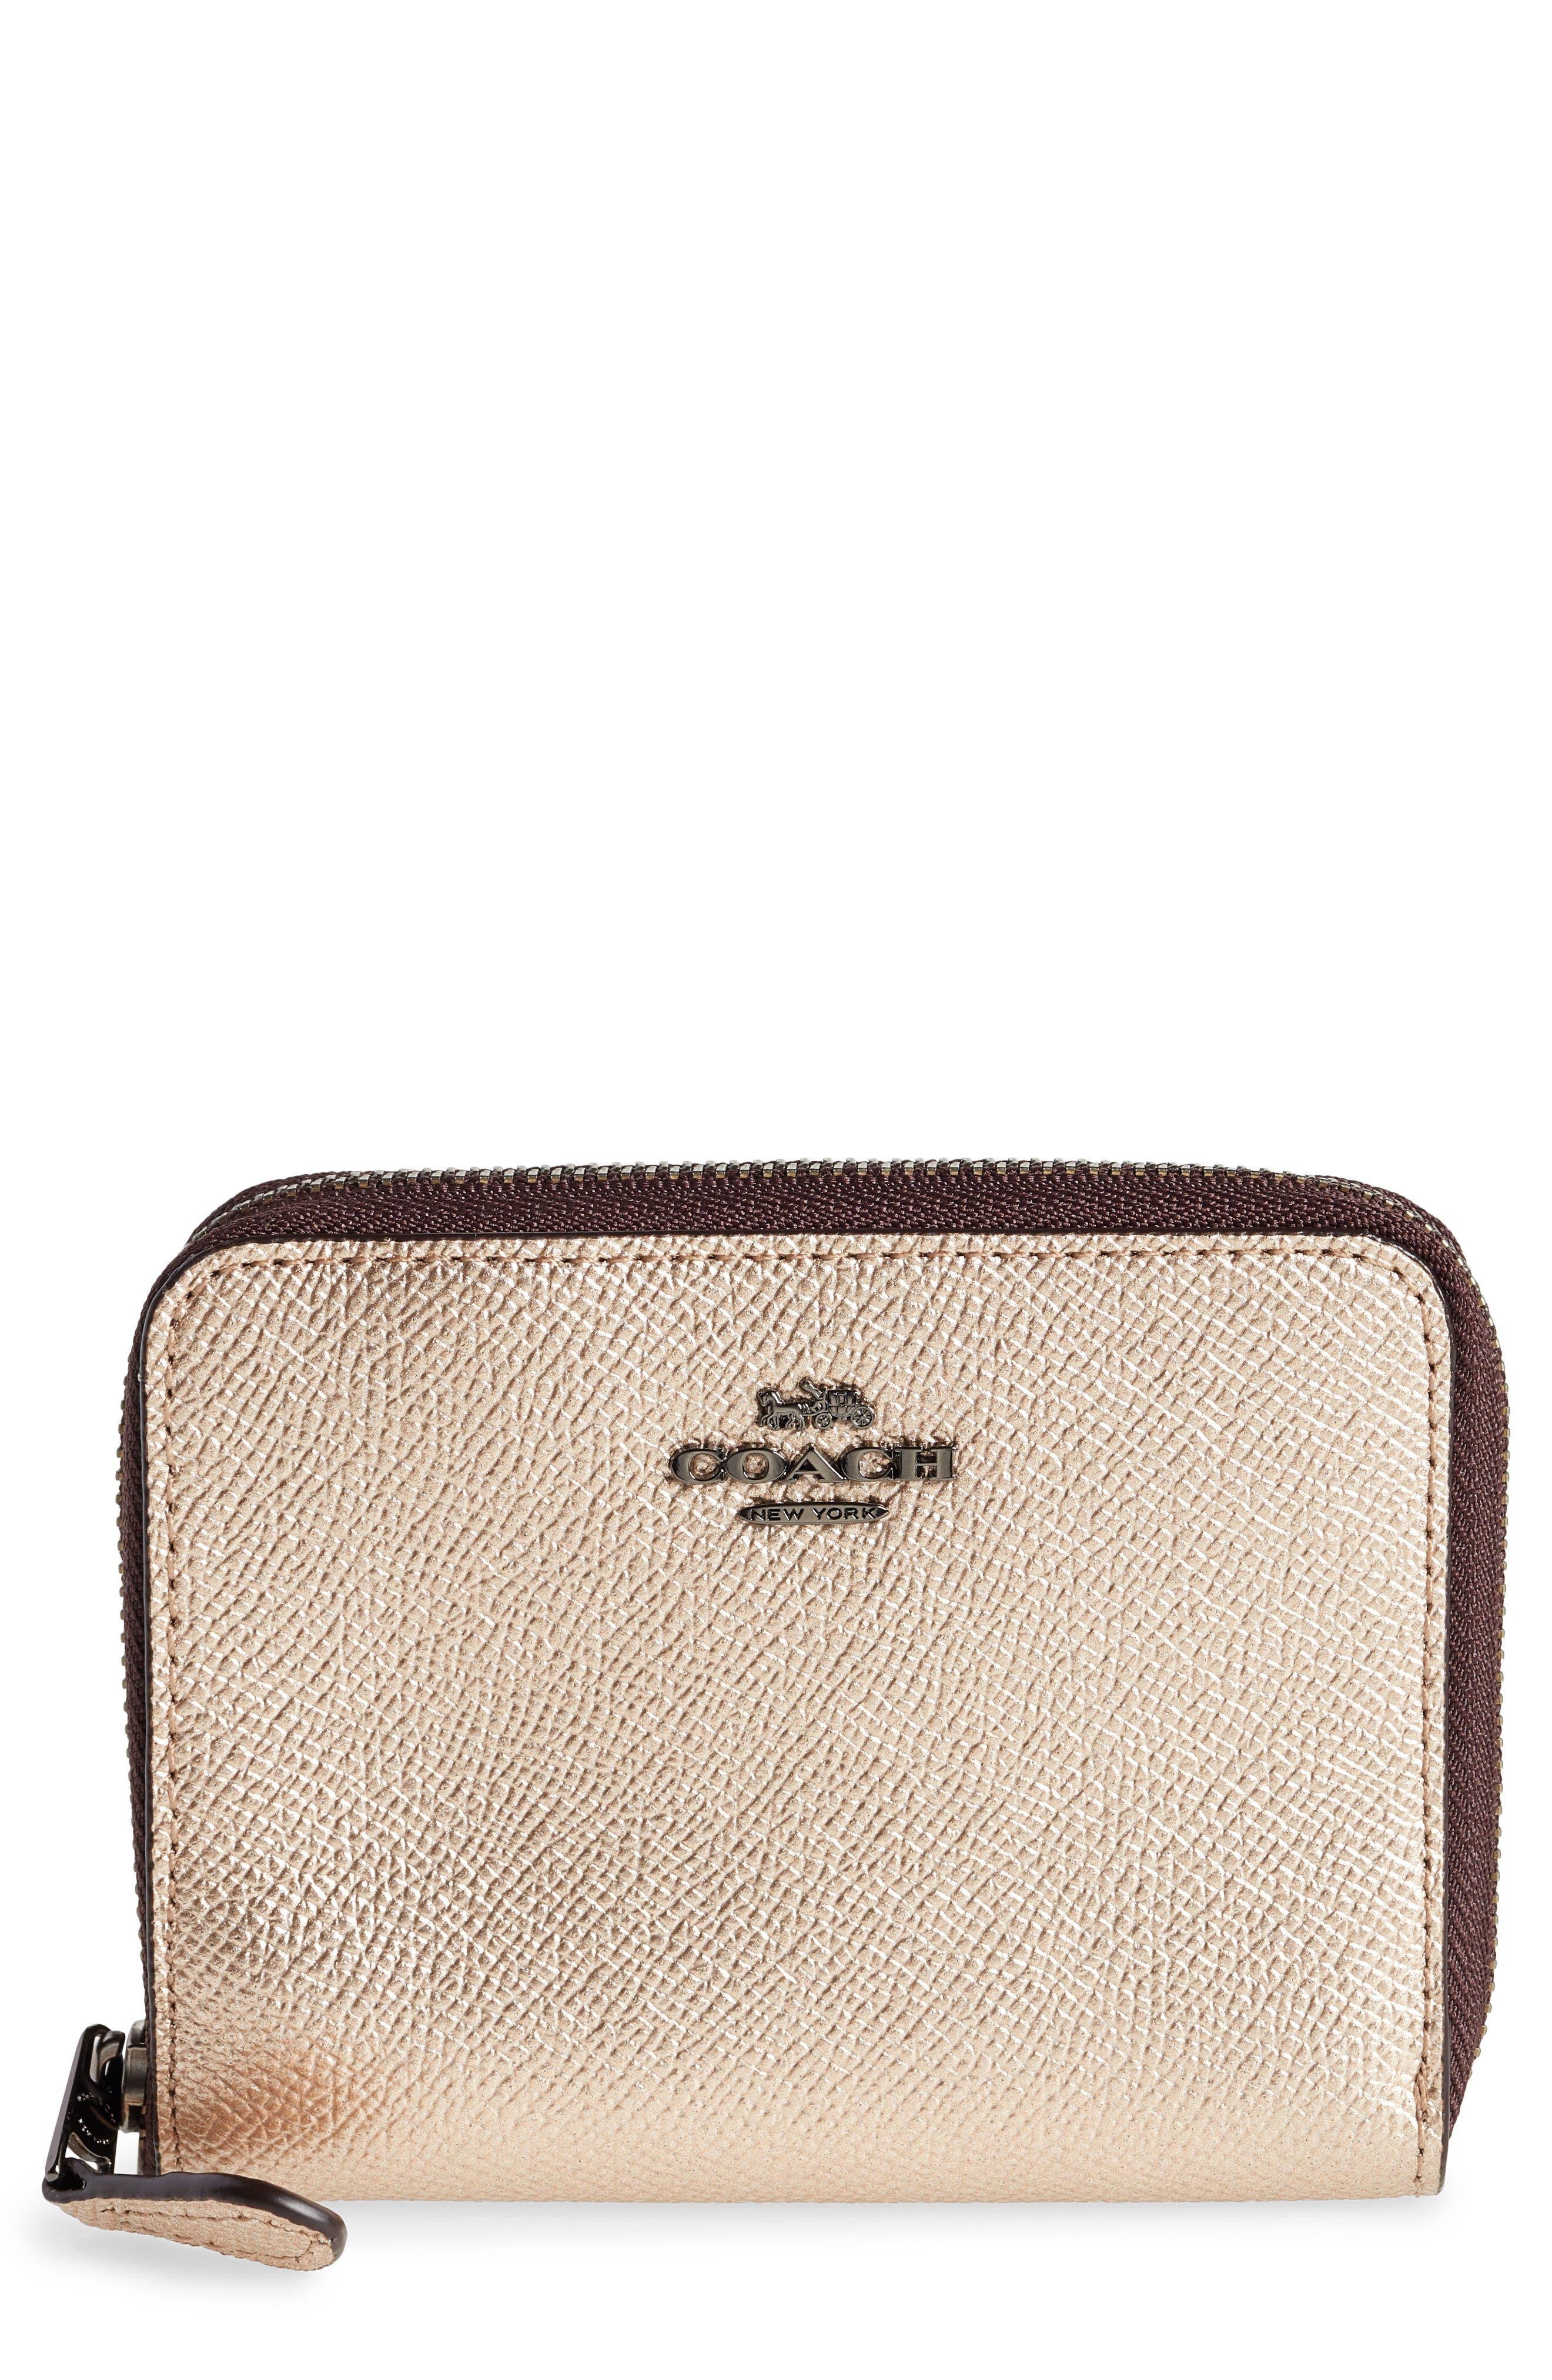 COACH,                             Small Metallic Leather Zip Around Wallet,                             Main thumbnail 1, color,                             PLATINUM